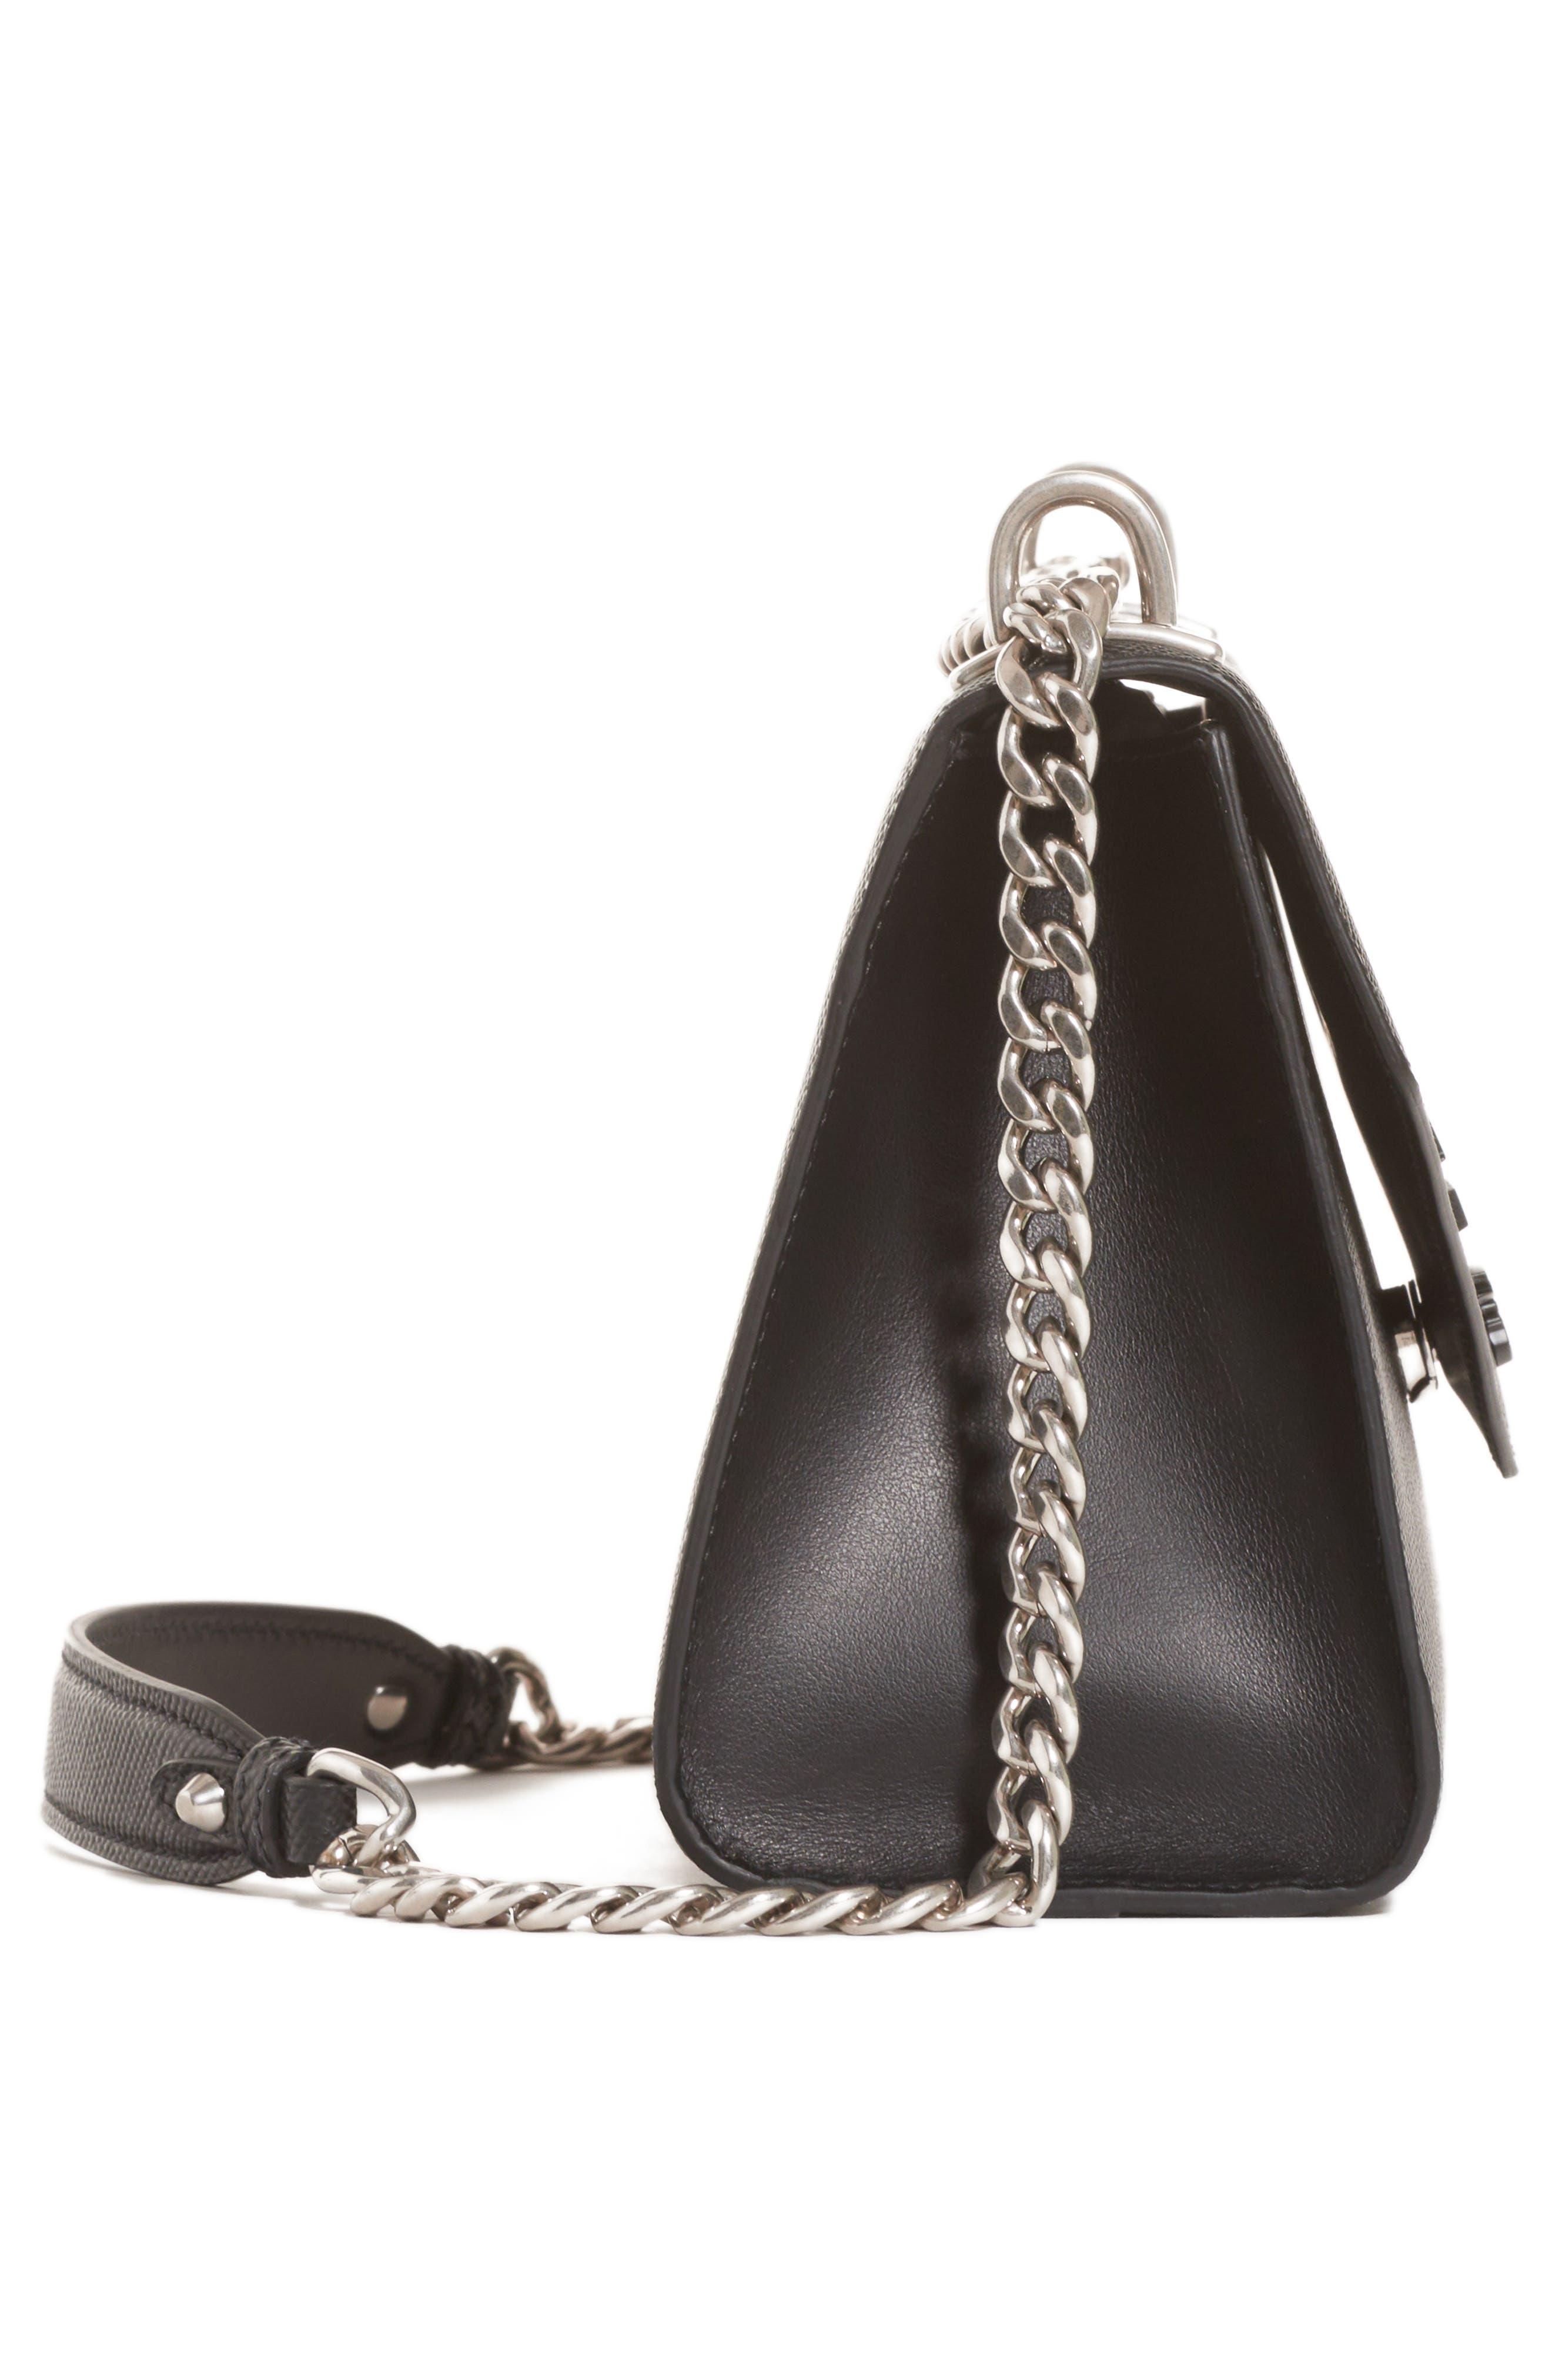 PRADA,                             Monochrome Saffiano Leather Shoulder Bag,                             Alternate thumbnail 4, color,                             NERO